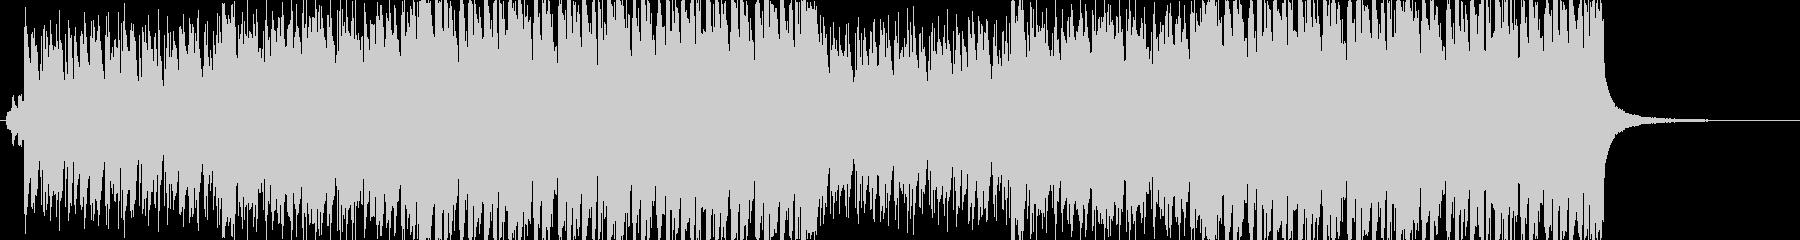 Happy Ukulele 3の未再生の波形